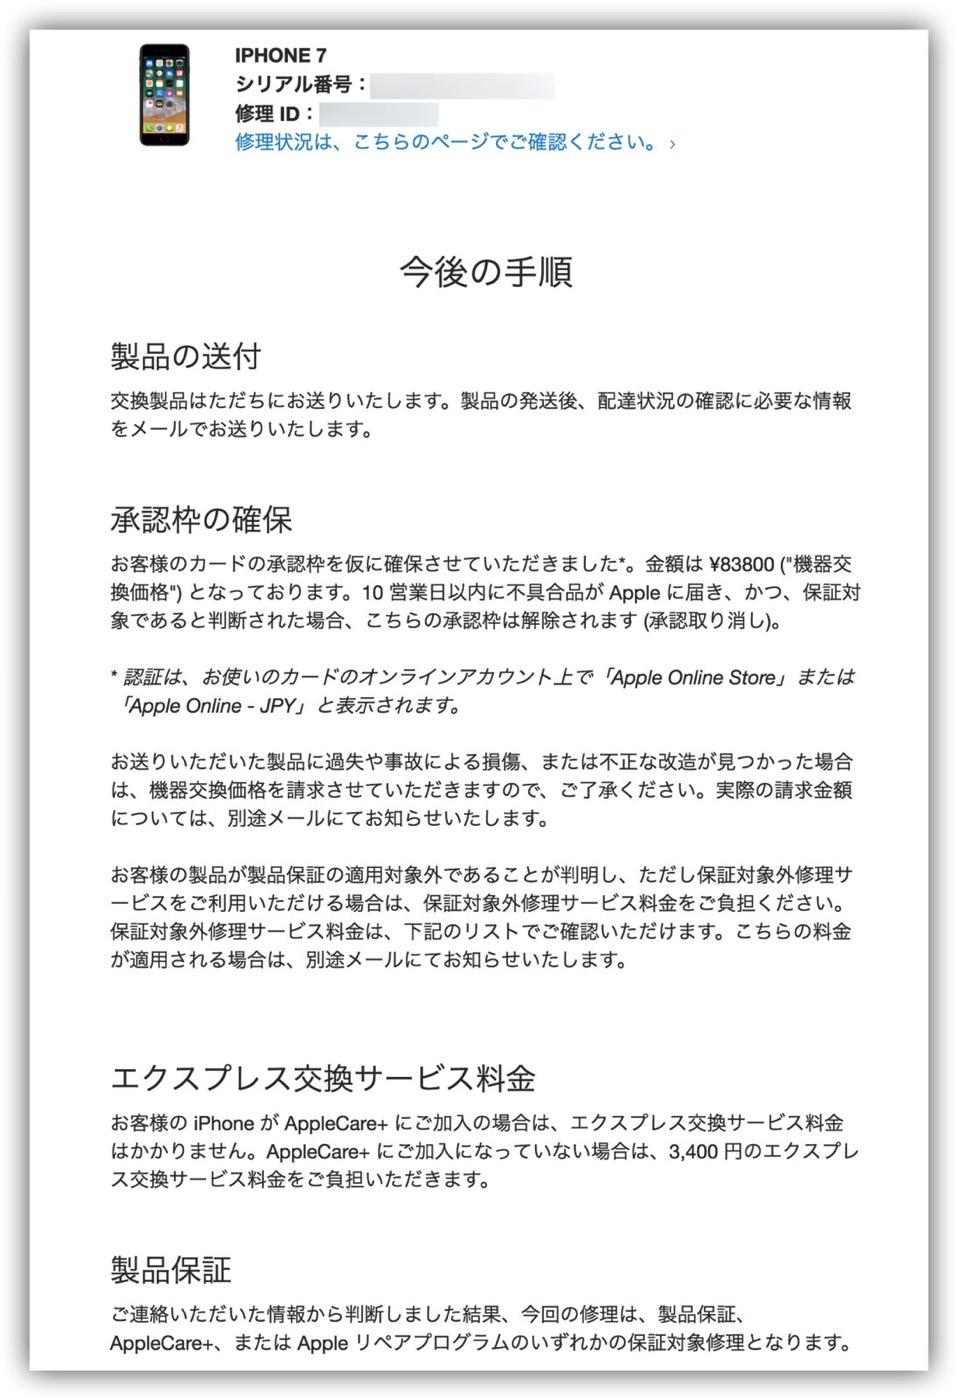 iPhoneエクスプレス交換サービス-5